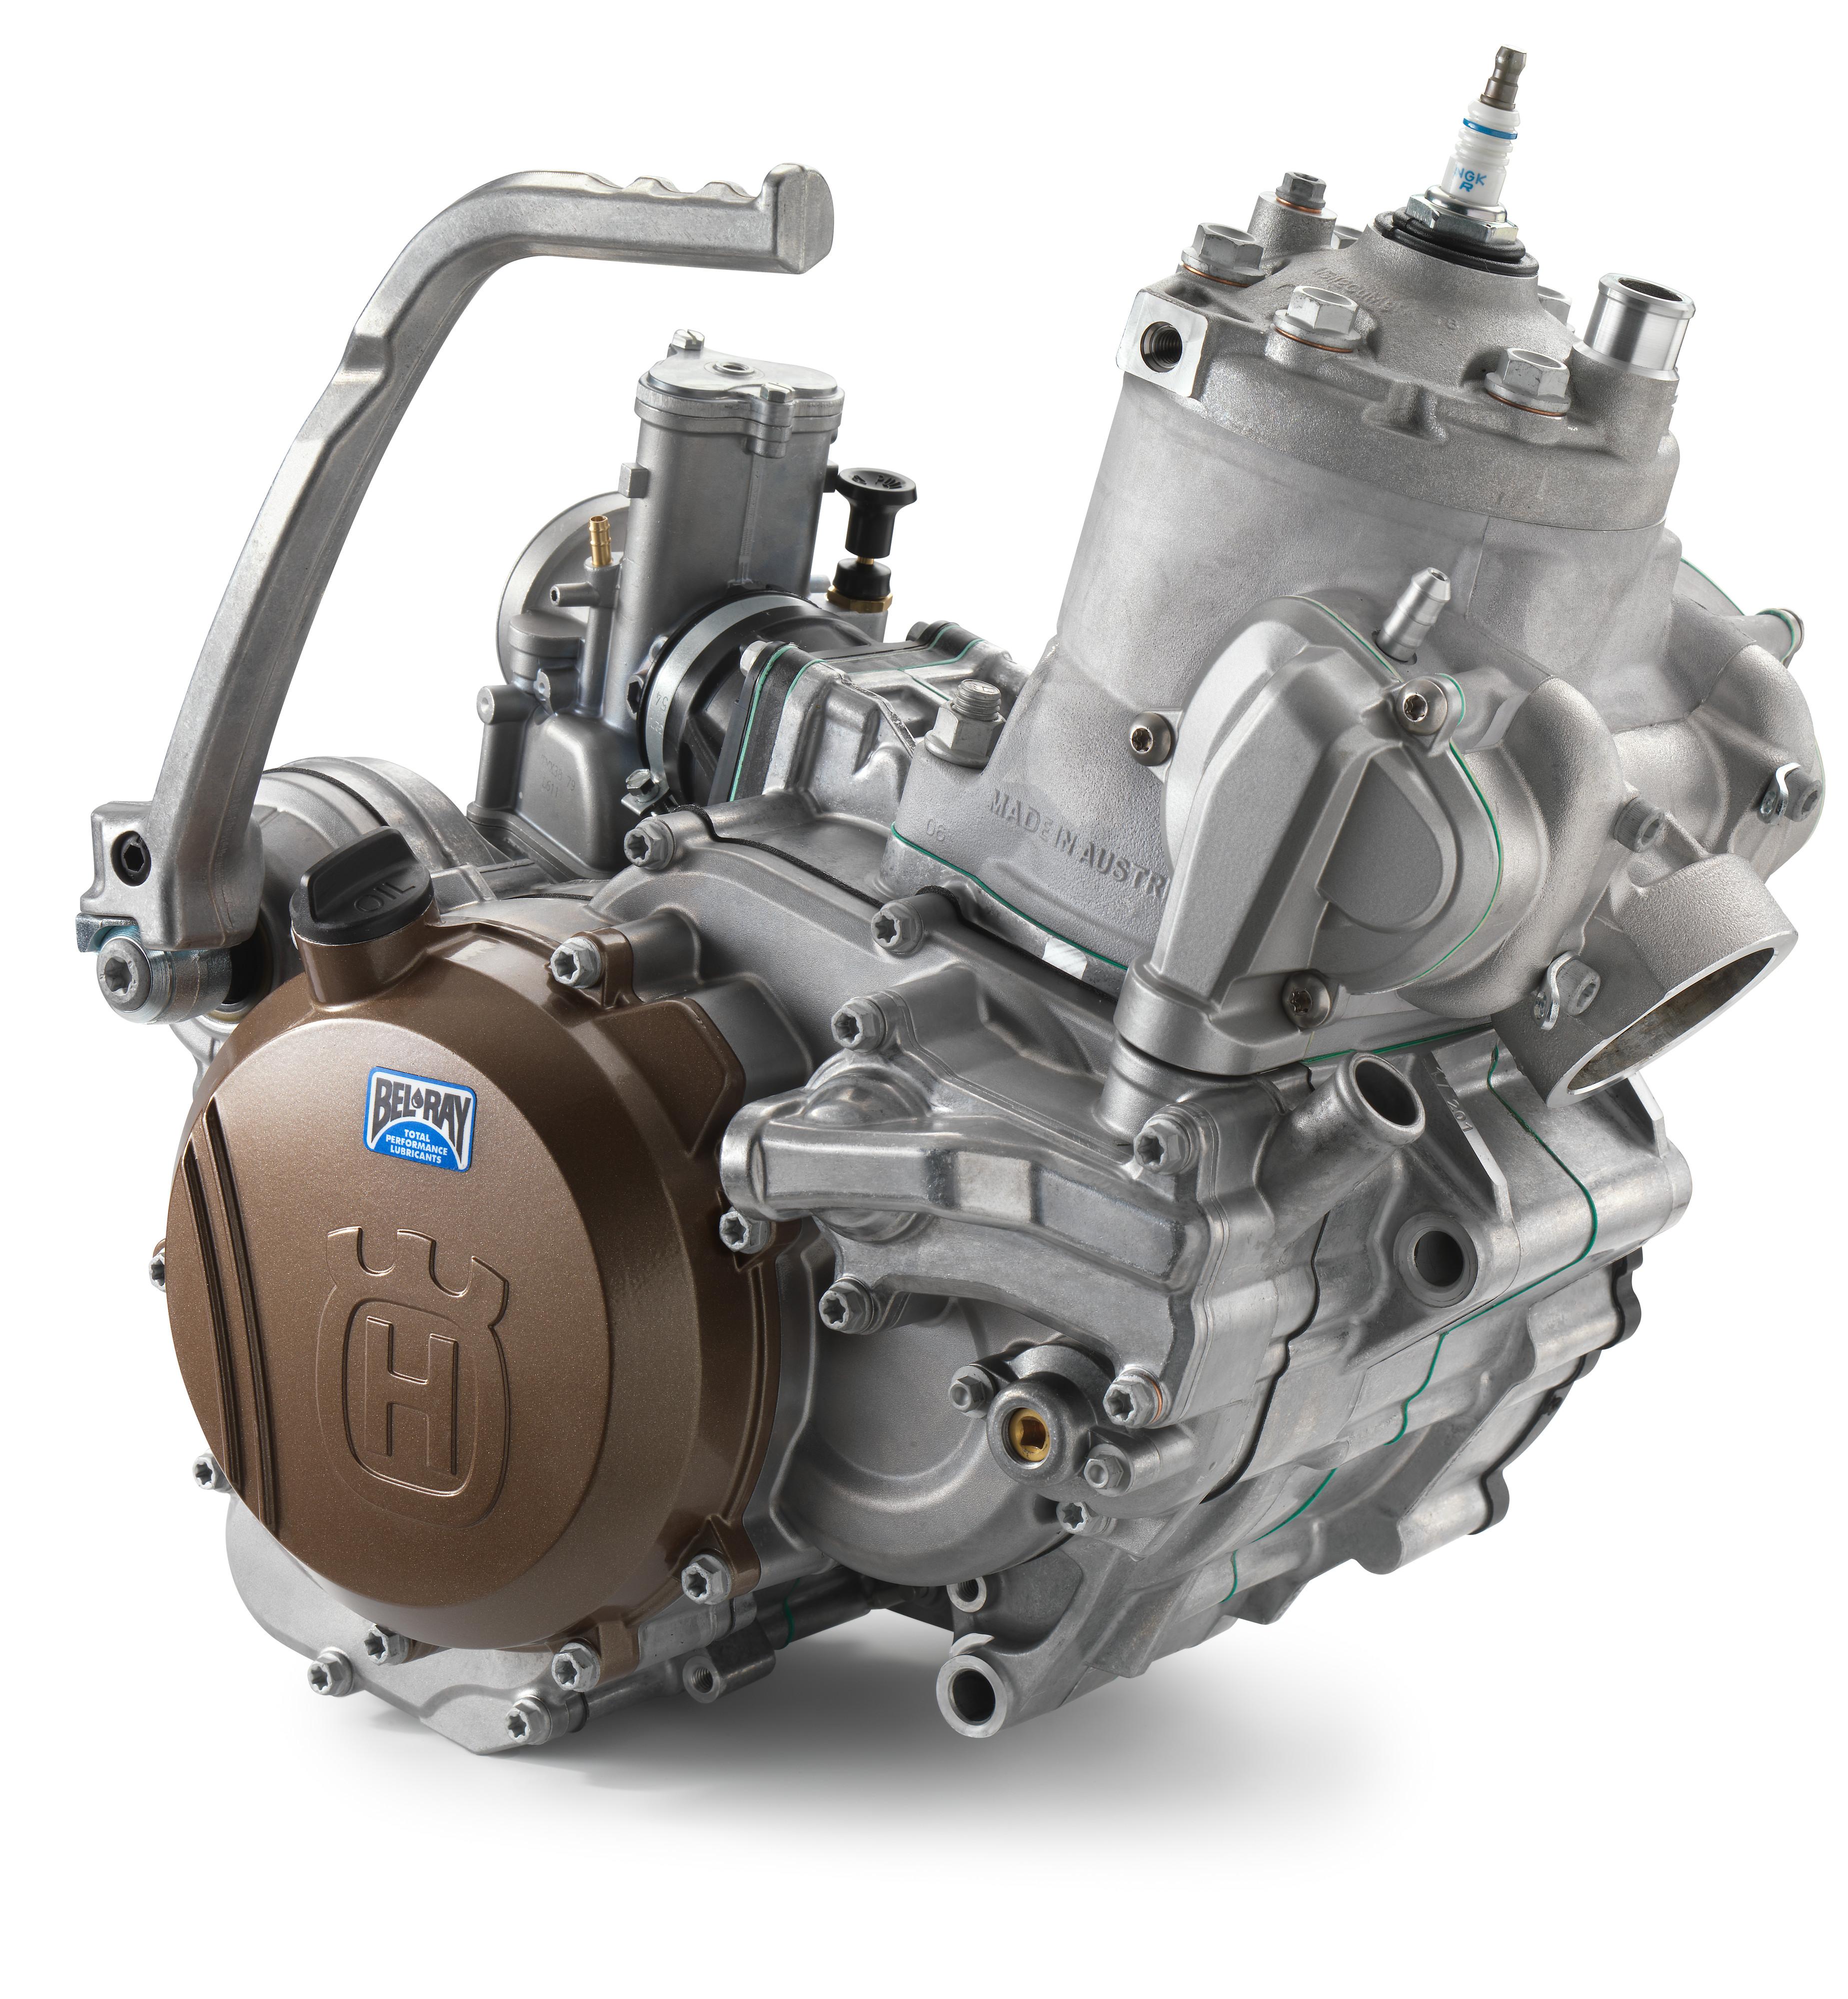 Rebuild Ktm Engines